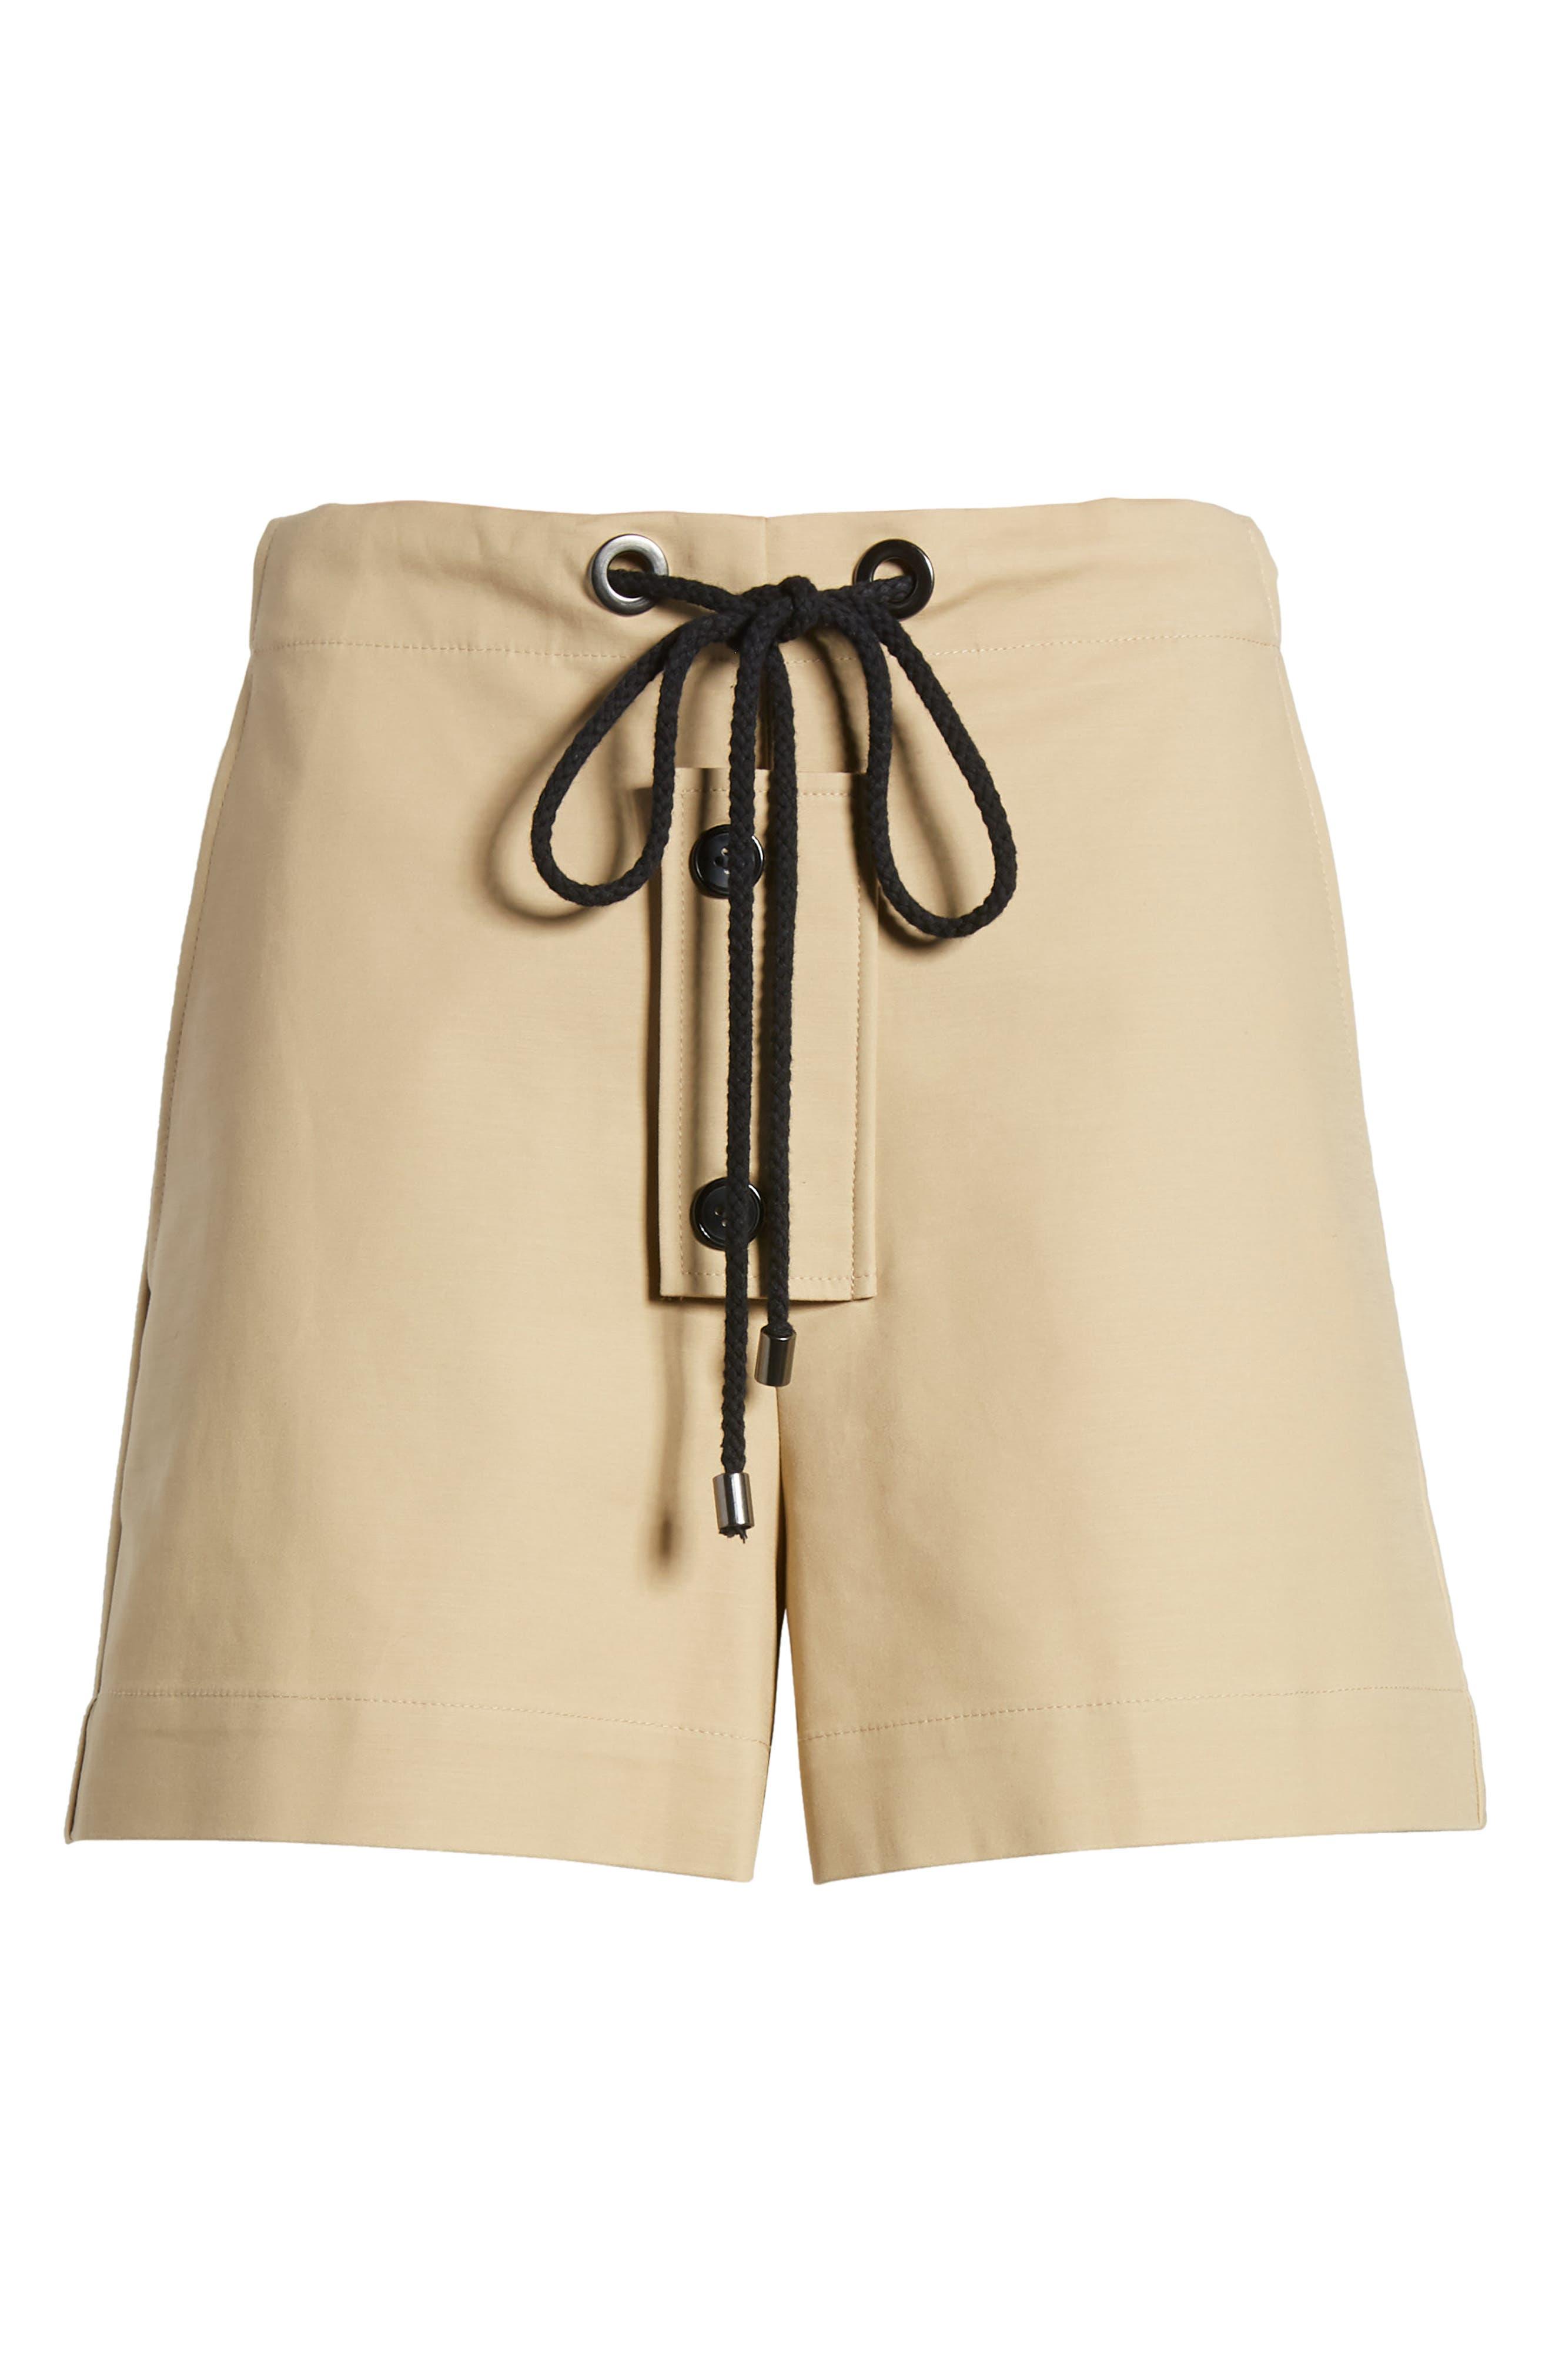 Park South Shorts,                             Alternate thumbnail 6, color,                             250